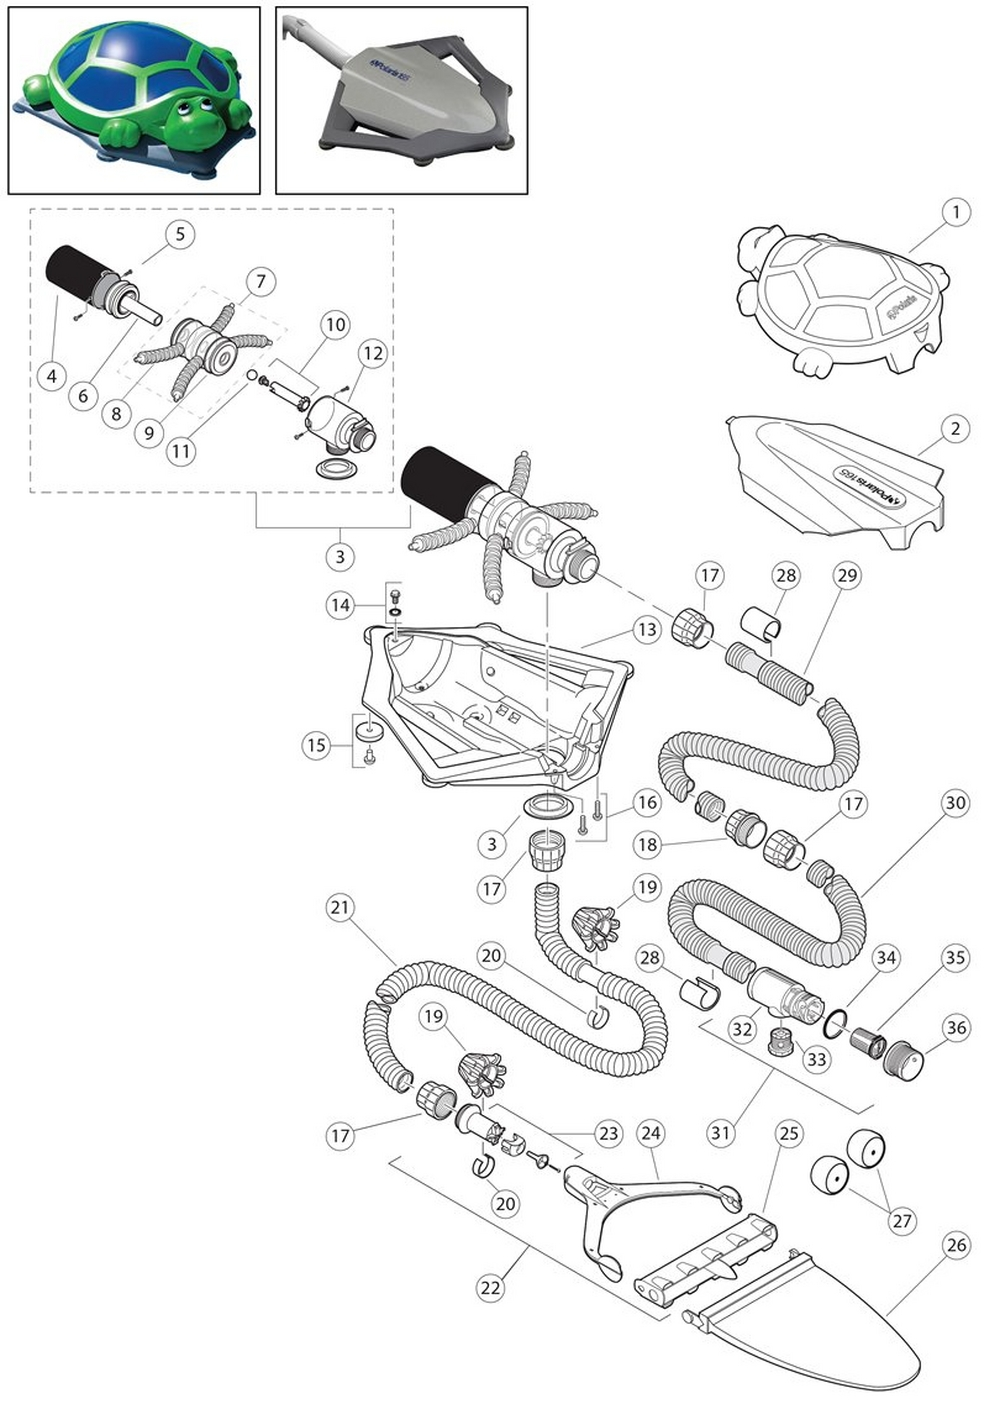 165 & Super Turtle Cleaner Parts image